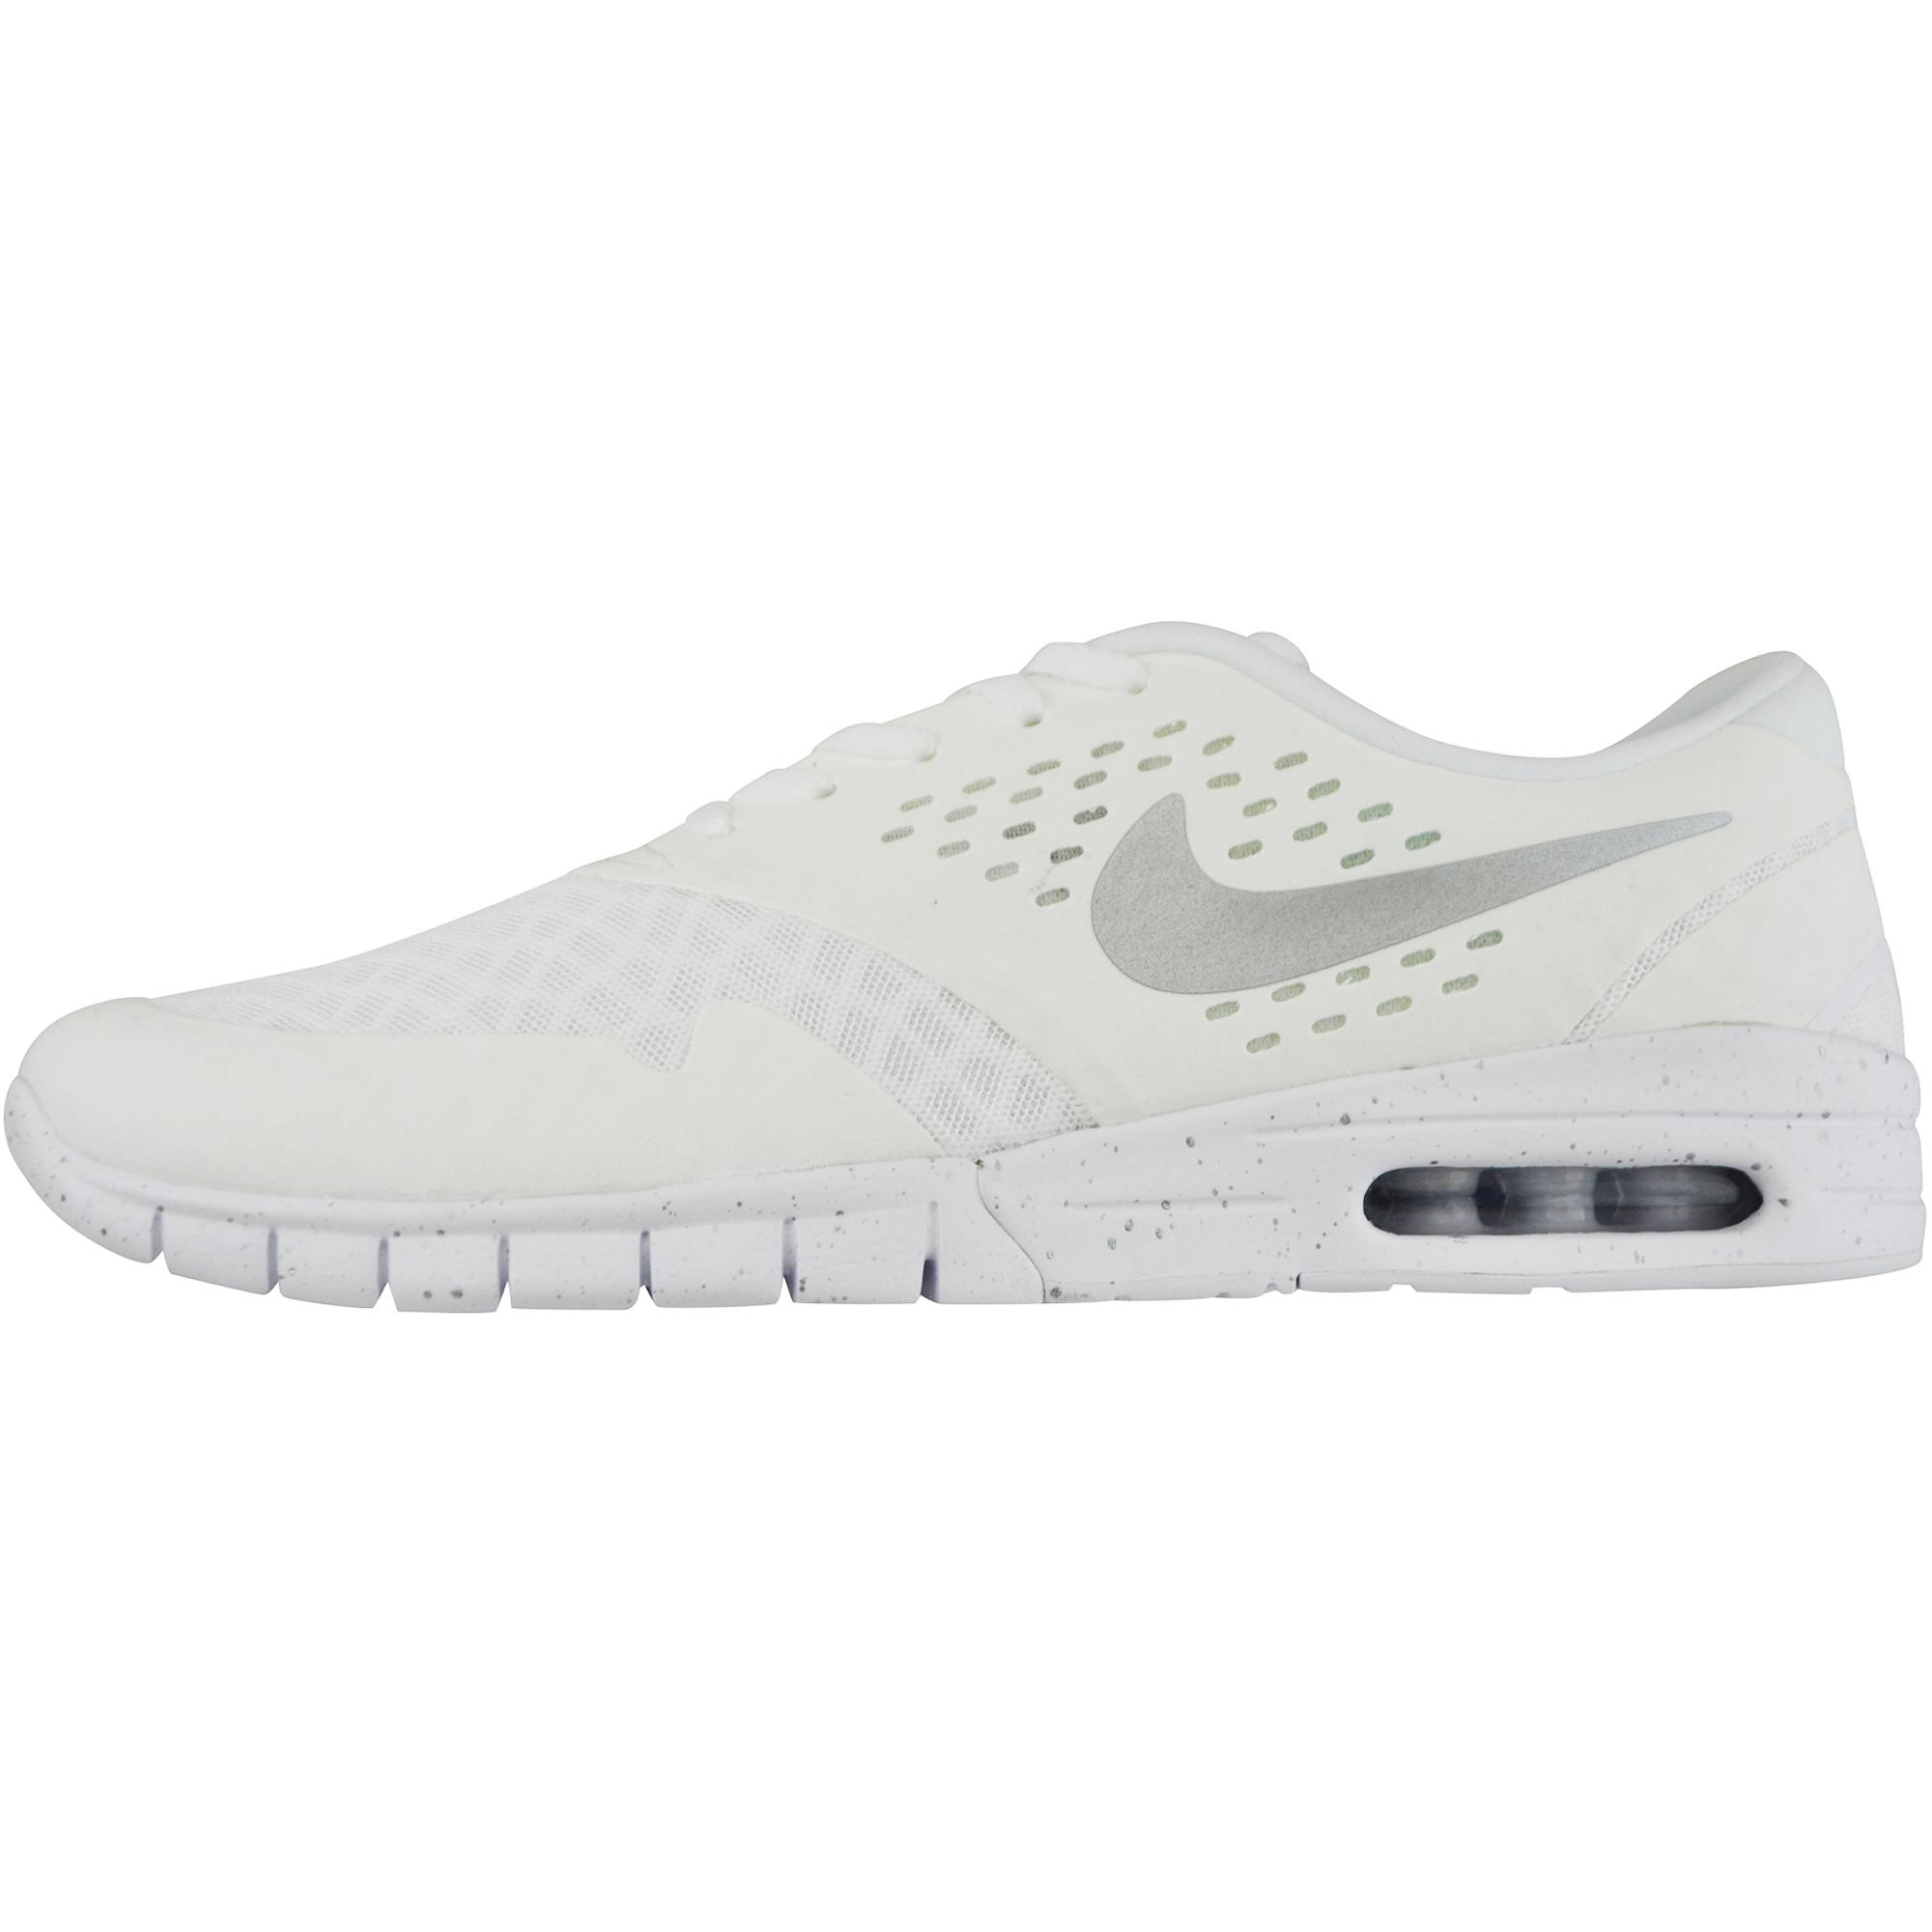 nike pas cher air max chaussures - Nike Free 5 Stefan Janoski Eric Costs 2 Air Max Roshe One Run ...